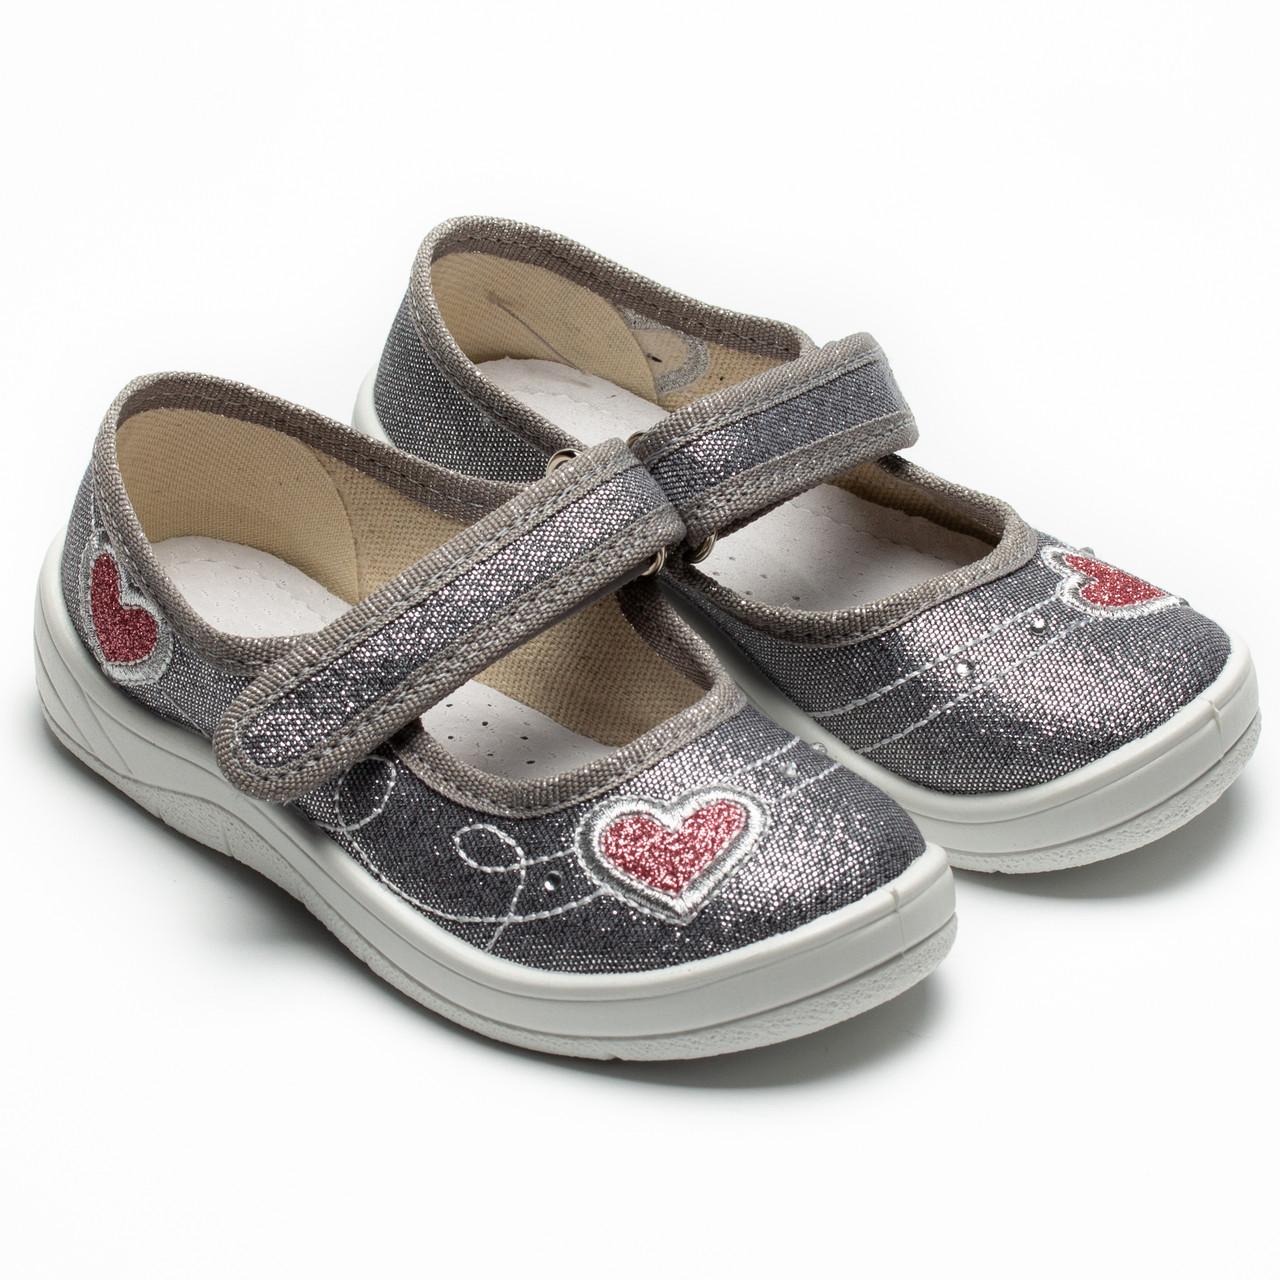 Тапочки Waldi для девочки, модель Алина, серебристого цвета с сердечком,  размер 24-30